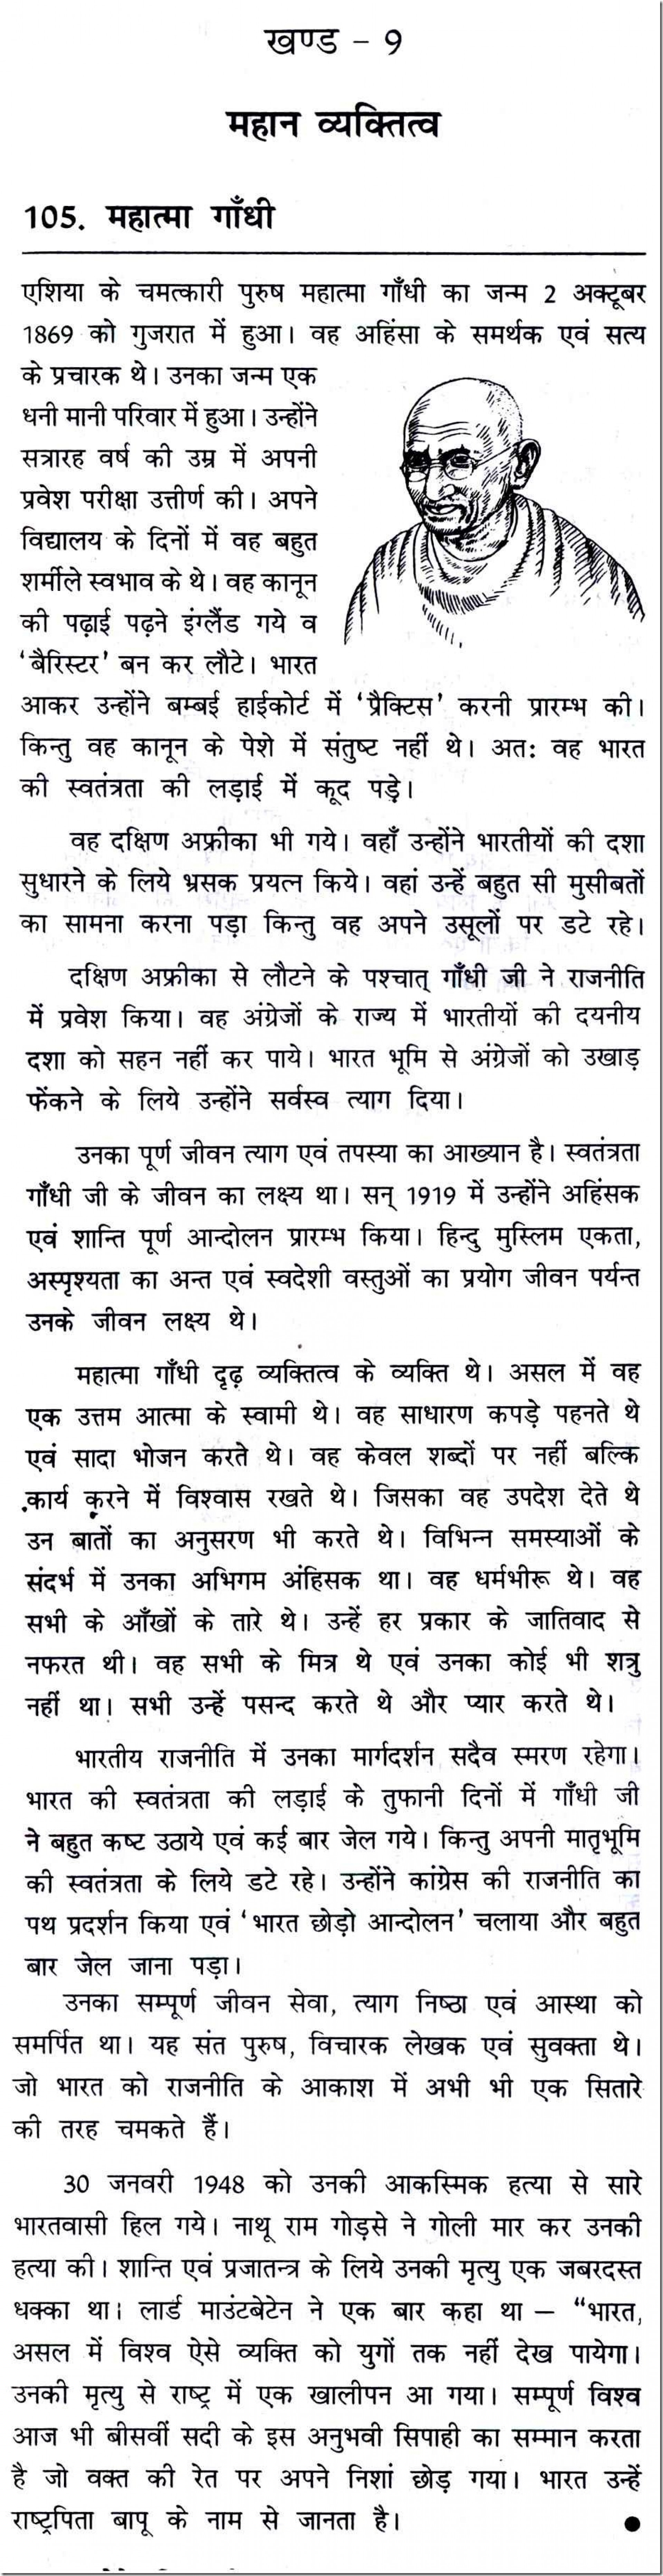 004 Gandhiji Essay 10107 Thumb Sensational Mahatma Gandhi In Gujarati Pdf Free Download Hindi Language Ma Nibandh 1920